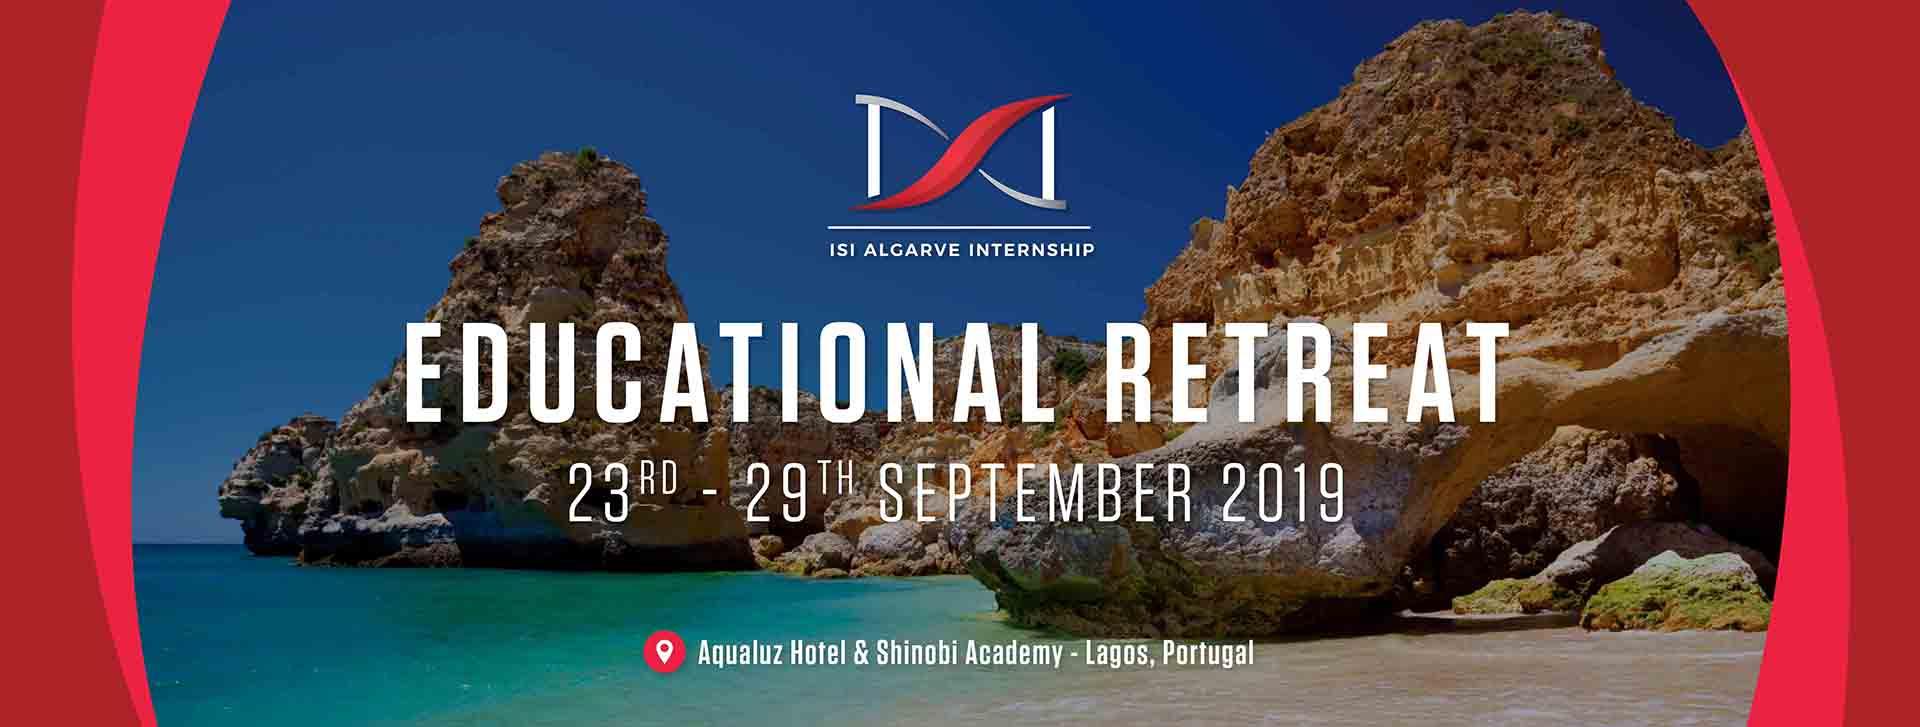 ISI Algarve Educational Retreat